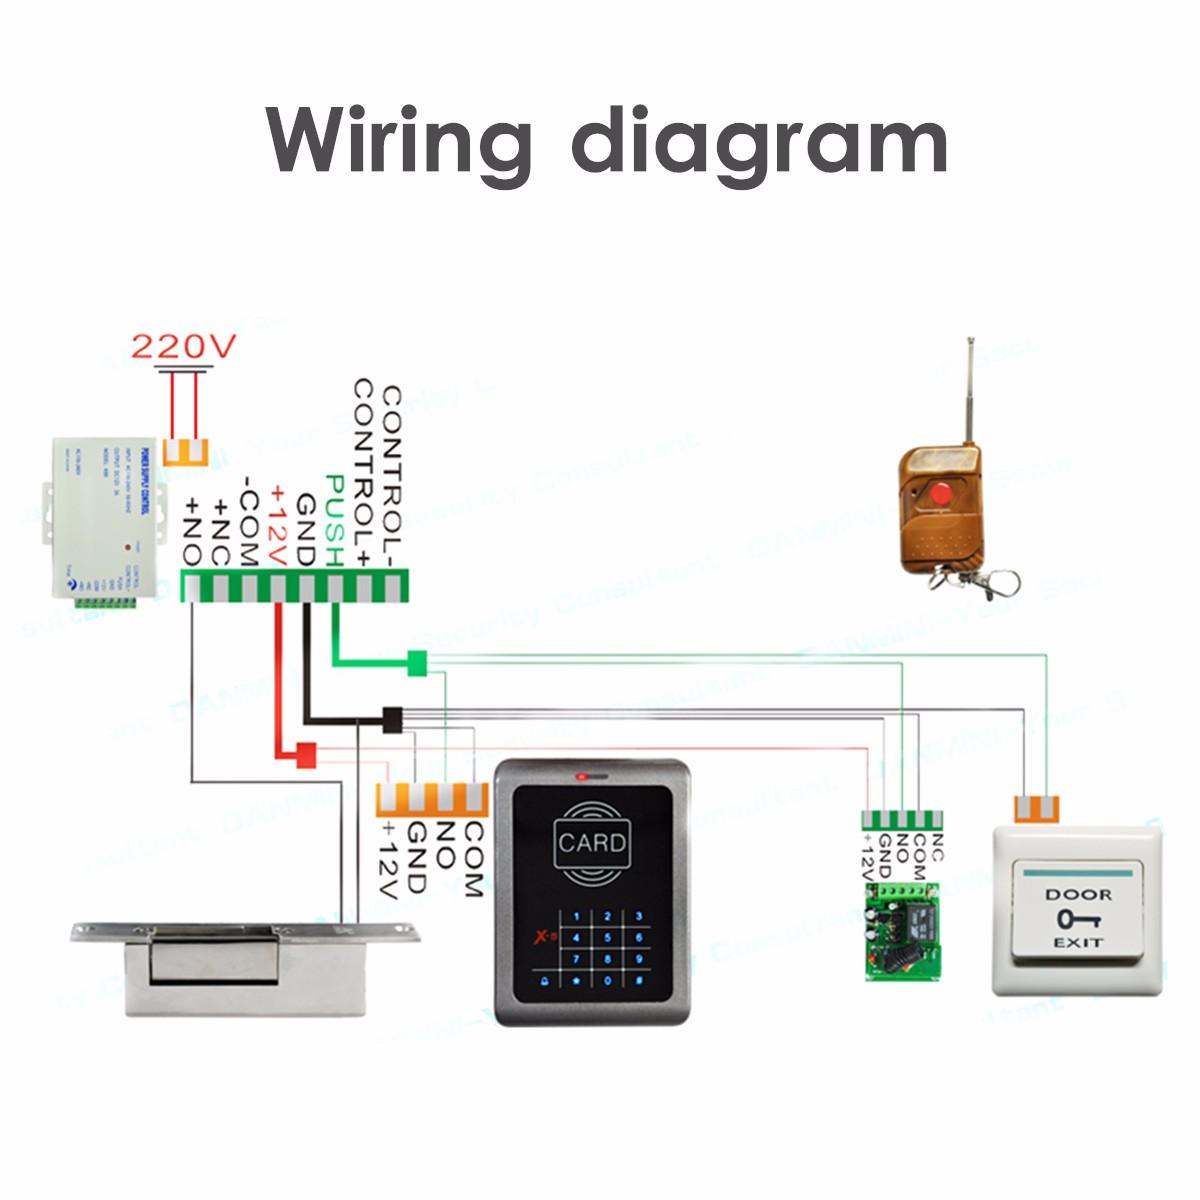 hight resolution of ef smart lock wiring diagram wiring diagram g9 mjpt001 electric door lock magnetic rfid entry access